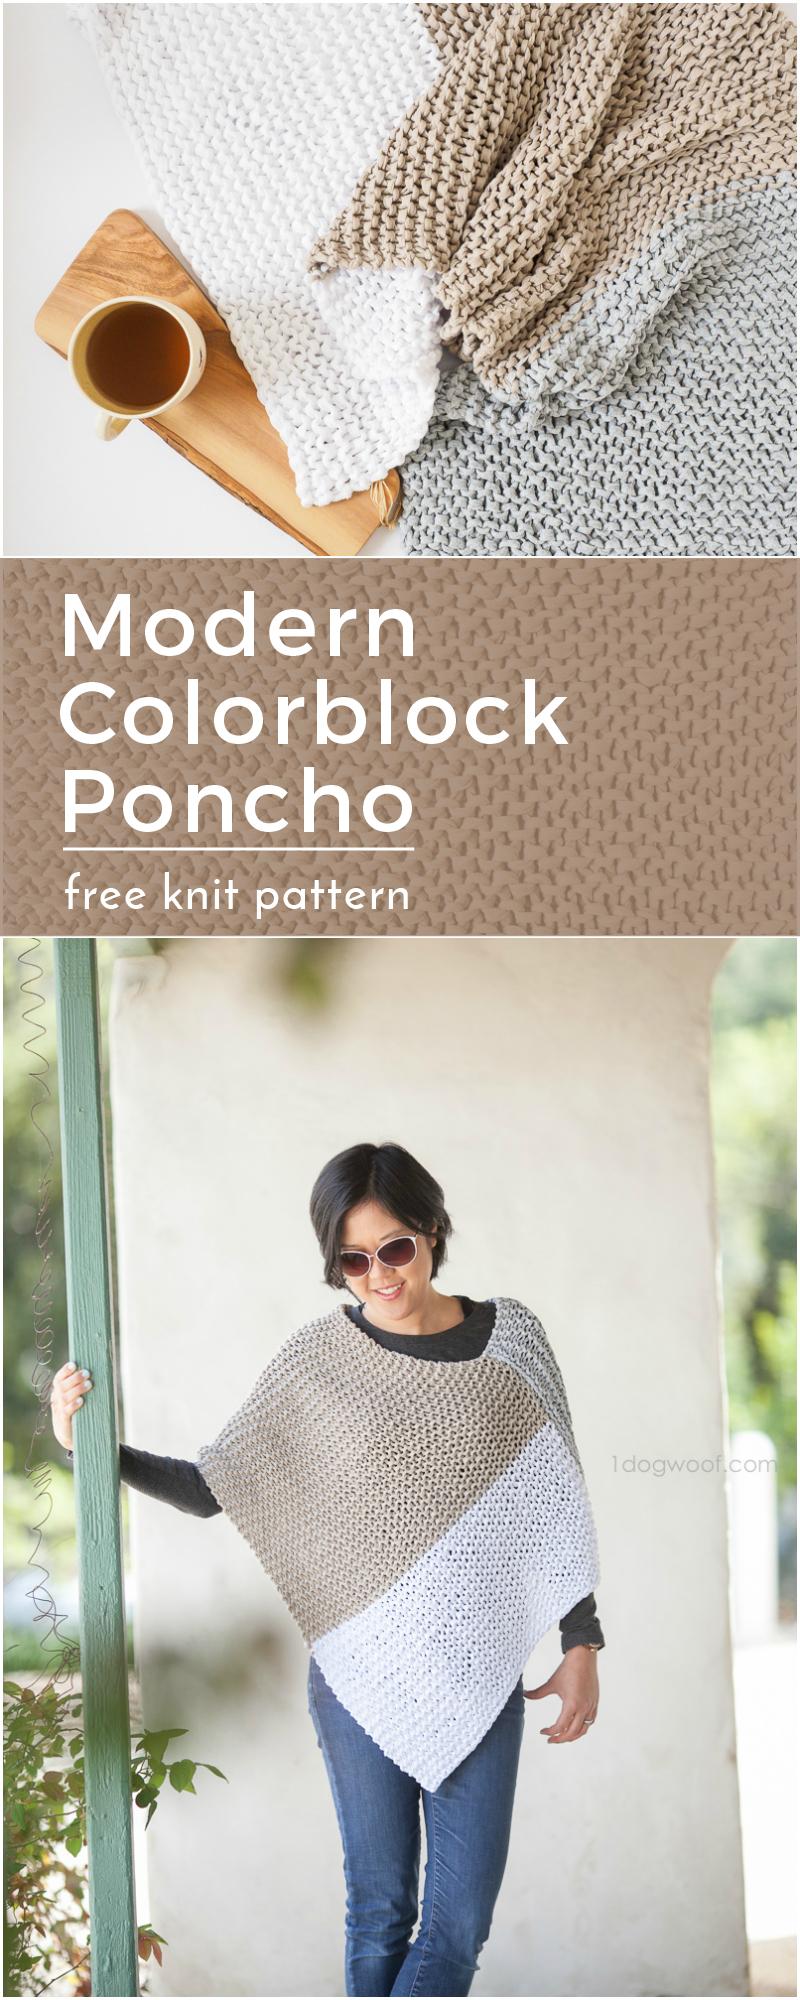 Knit Stitch Patterns: How to Do a Knit Stitch and Garter Stitch ...